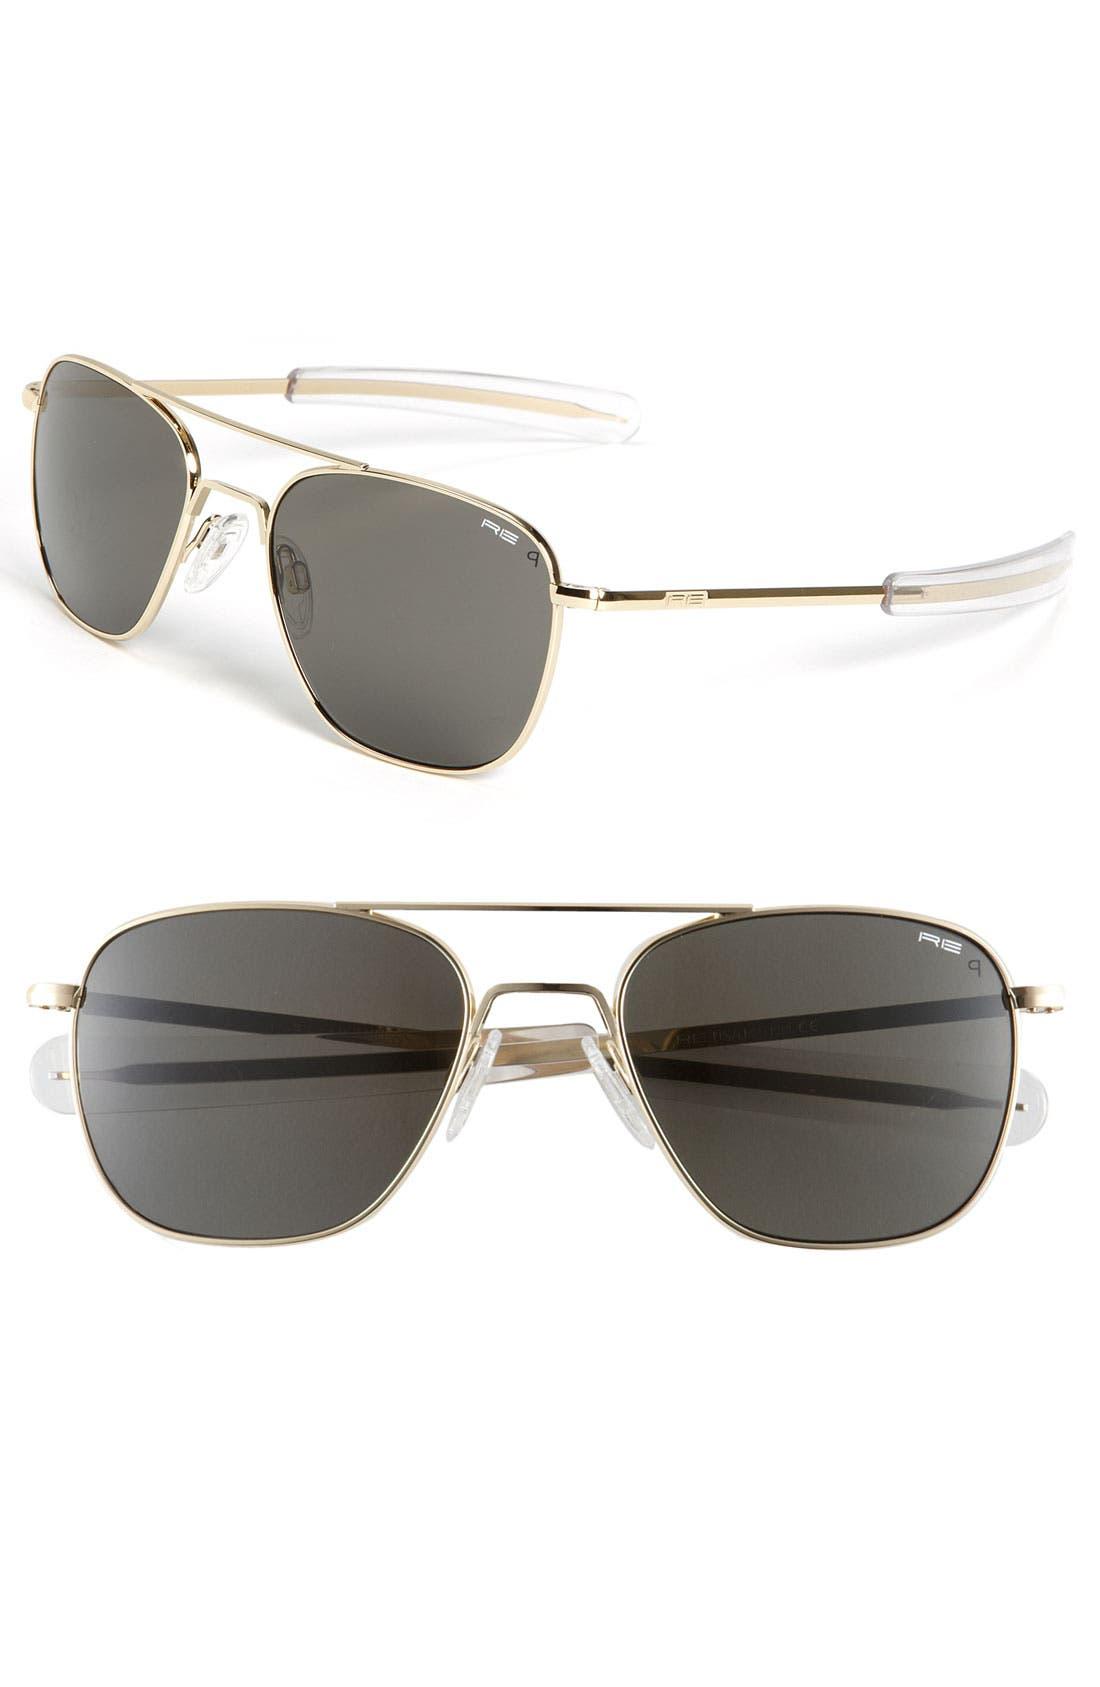 55mm Aviator Sunglasses,                         Main,                         color, 710